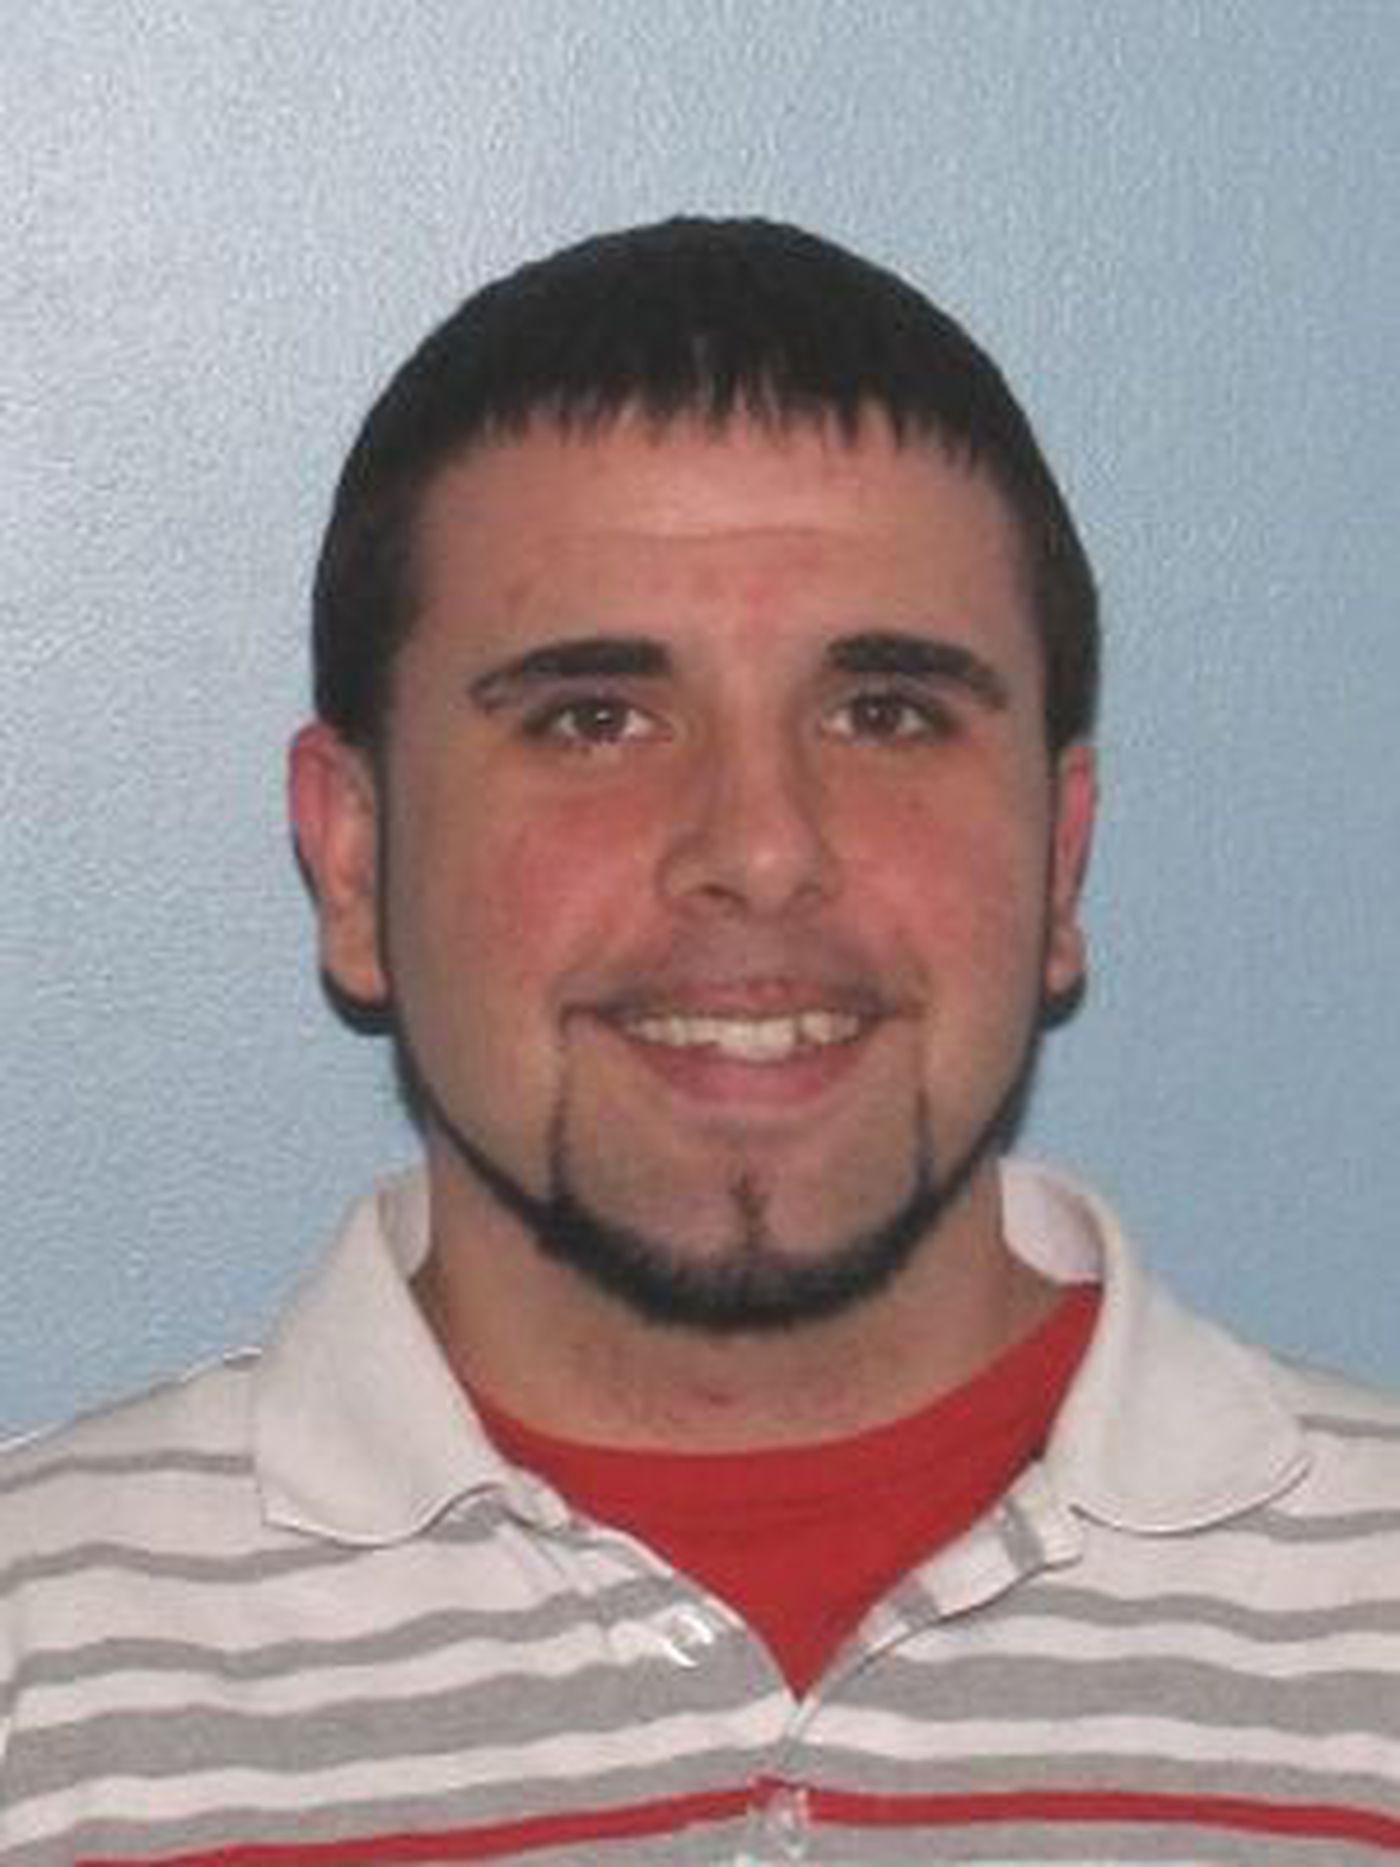 NOVFTF Fugitive of the week: Jason Hudson